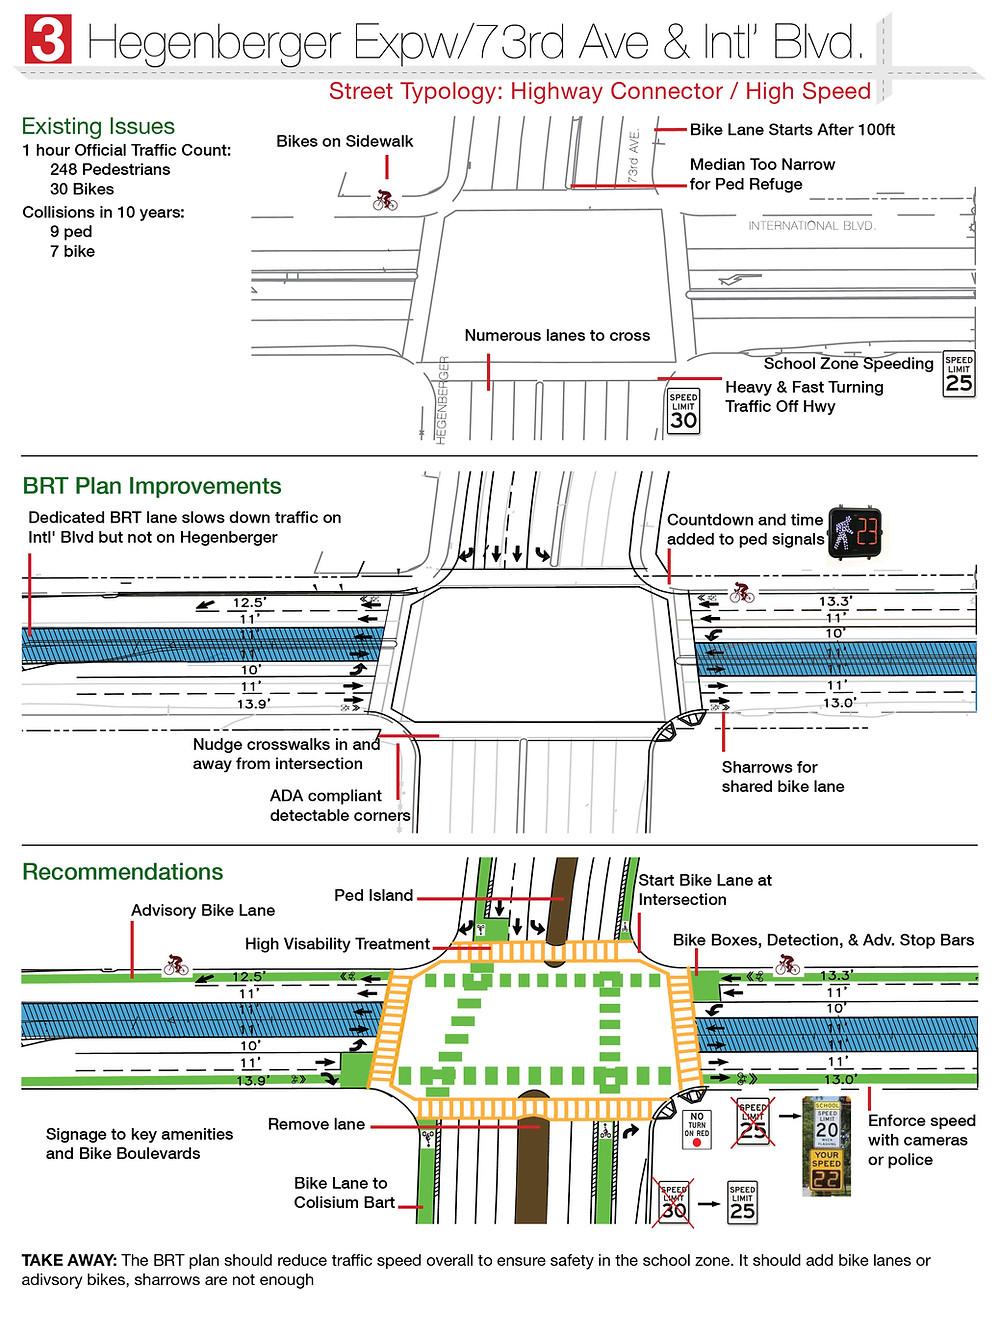 BRT7.jpg